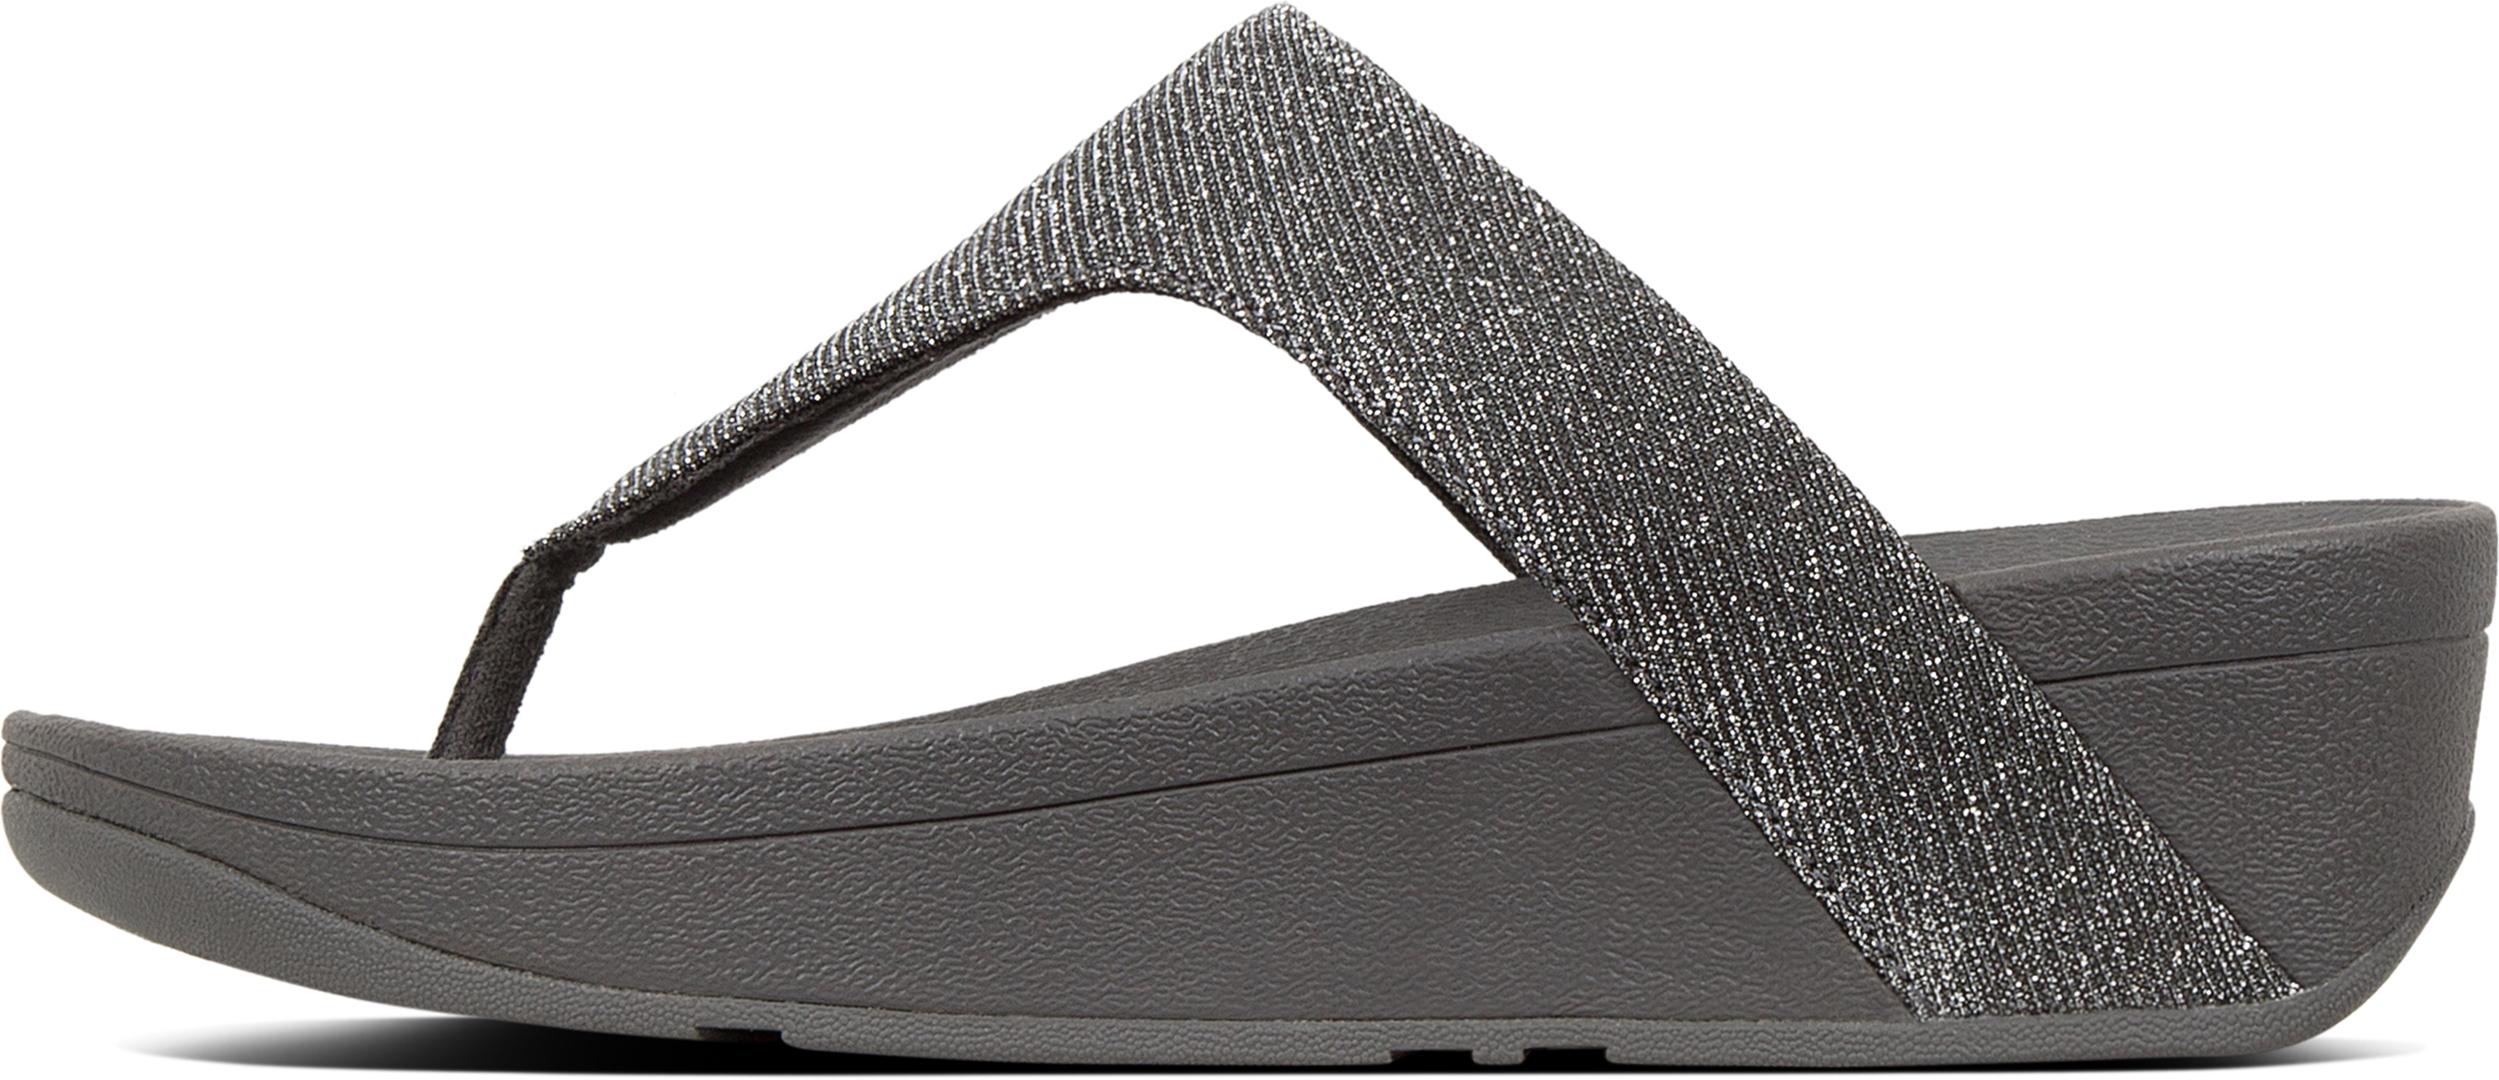 f7a02917d910 LOTTIE GLITZY Sandal 2019 pewter